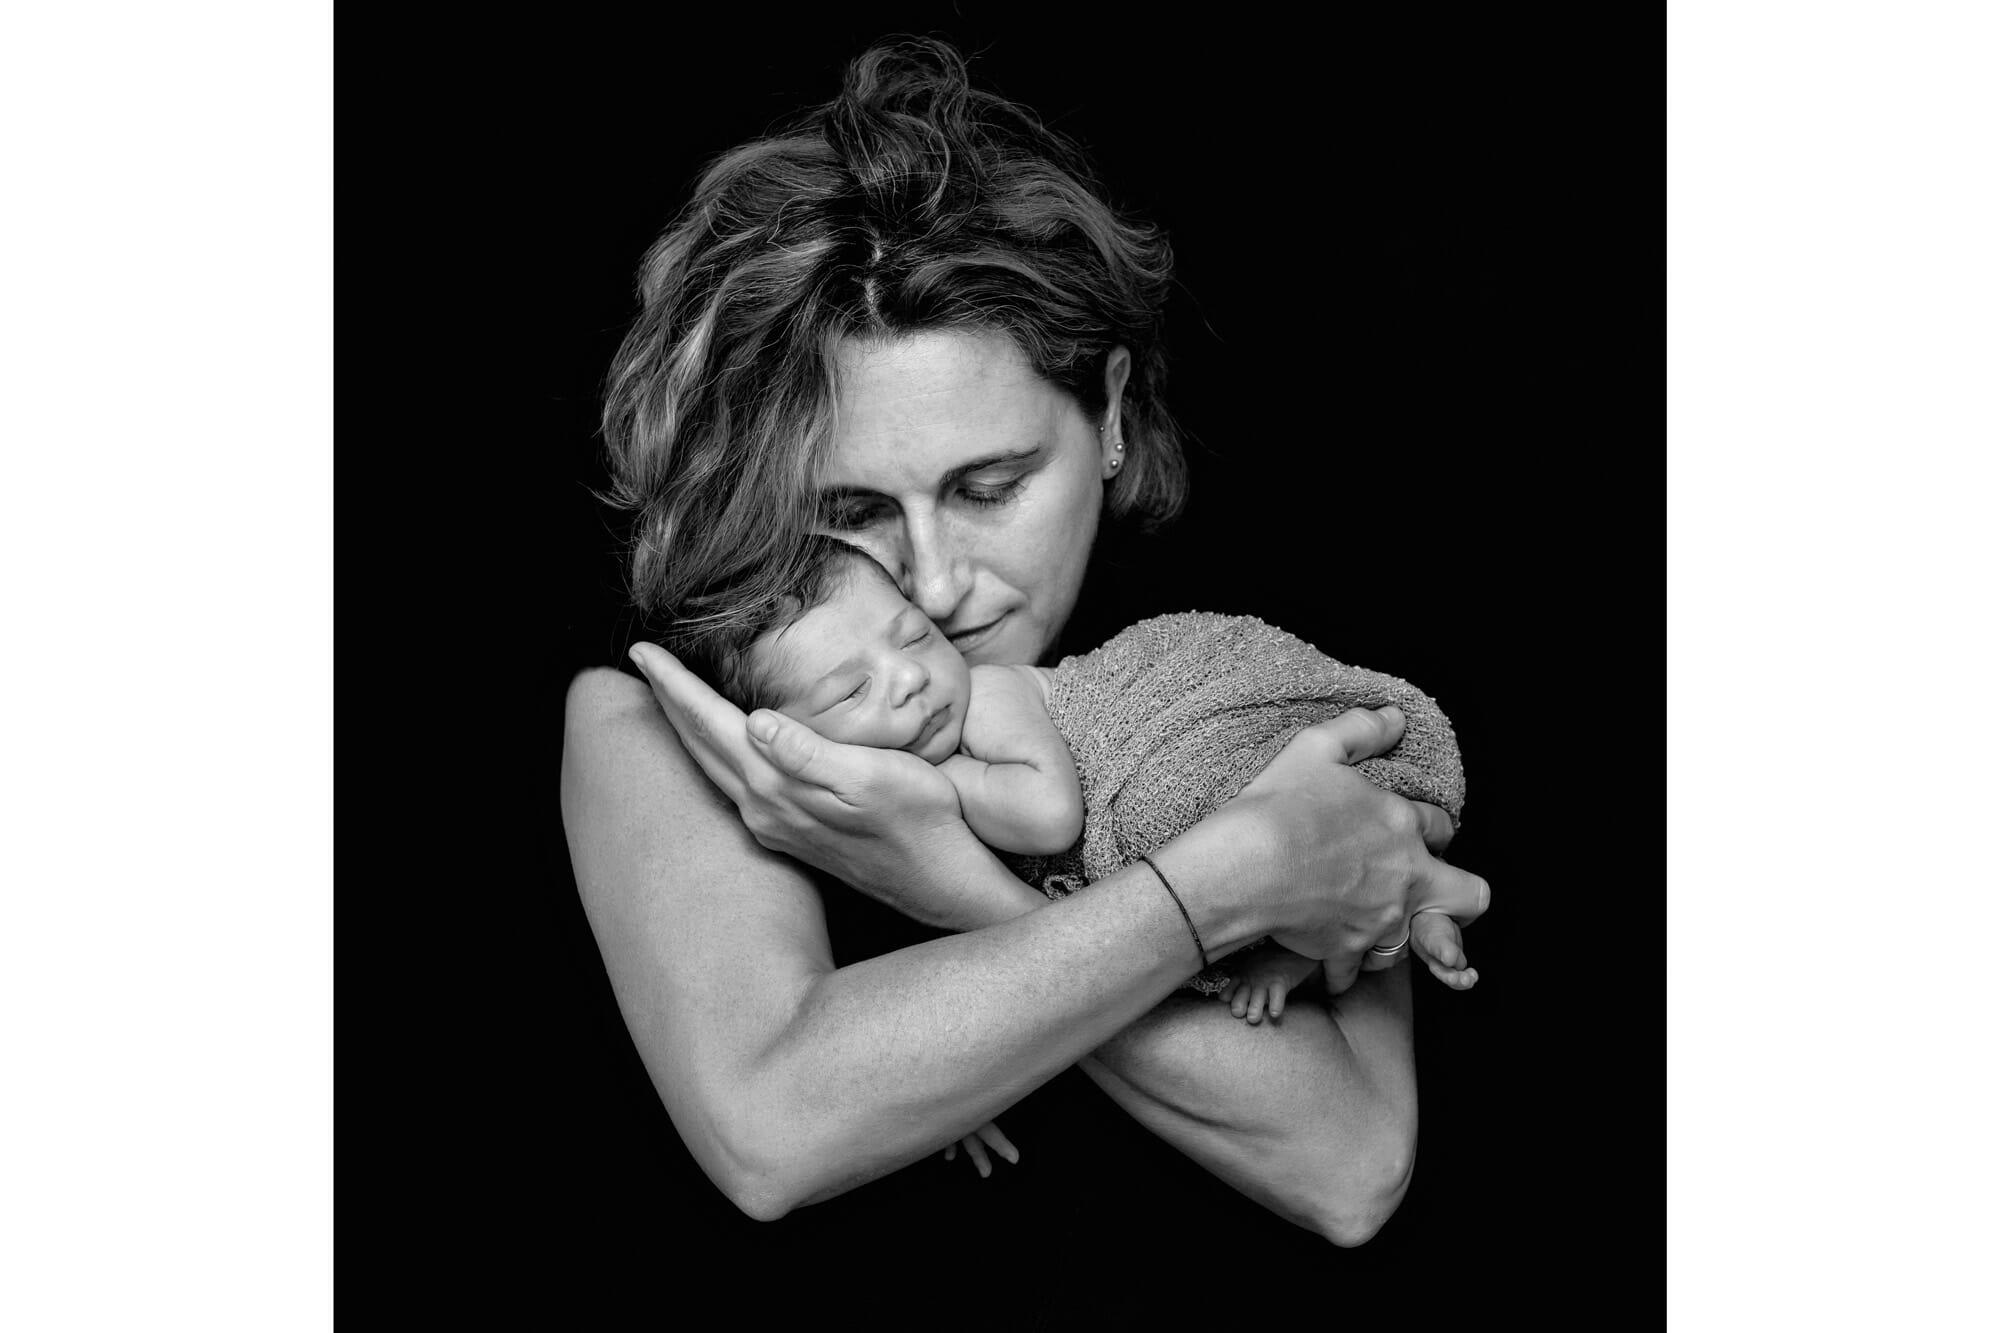 fotografia di maternità